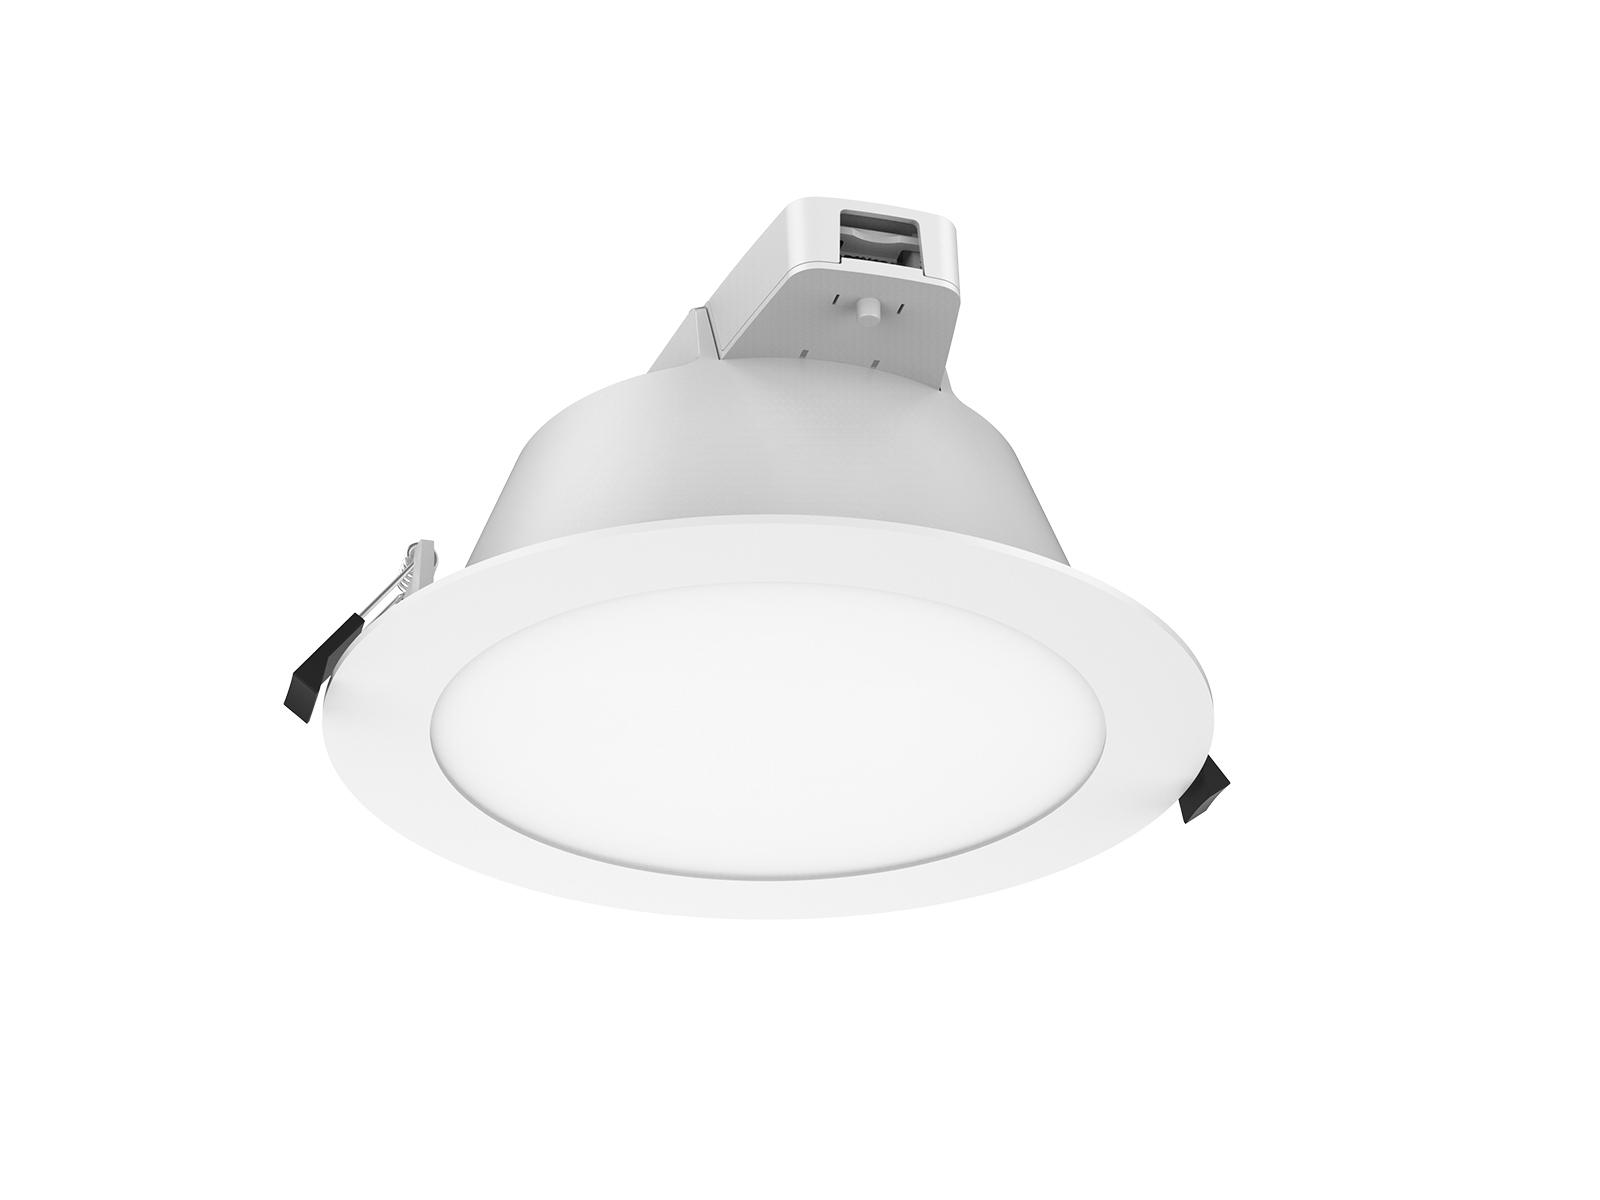 8 Inch Led Recessed Mount Ceiling Light Upshine Lighting Wiring Diagram 277v